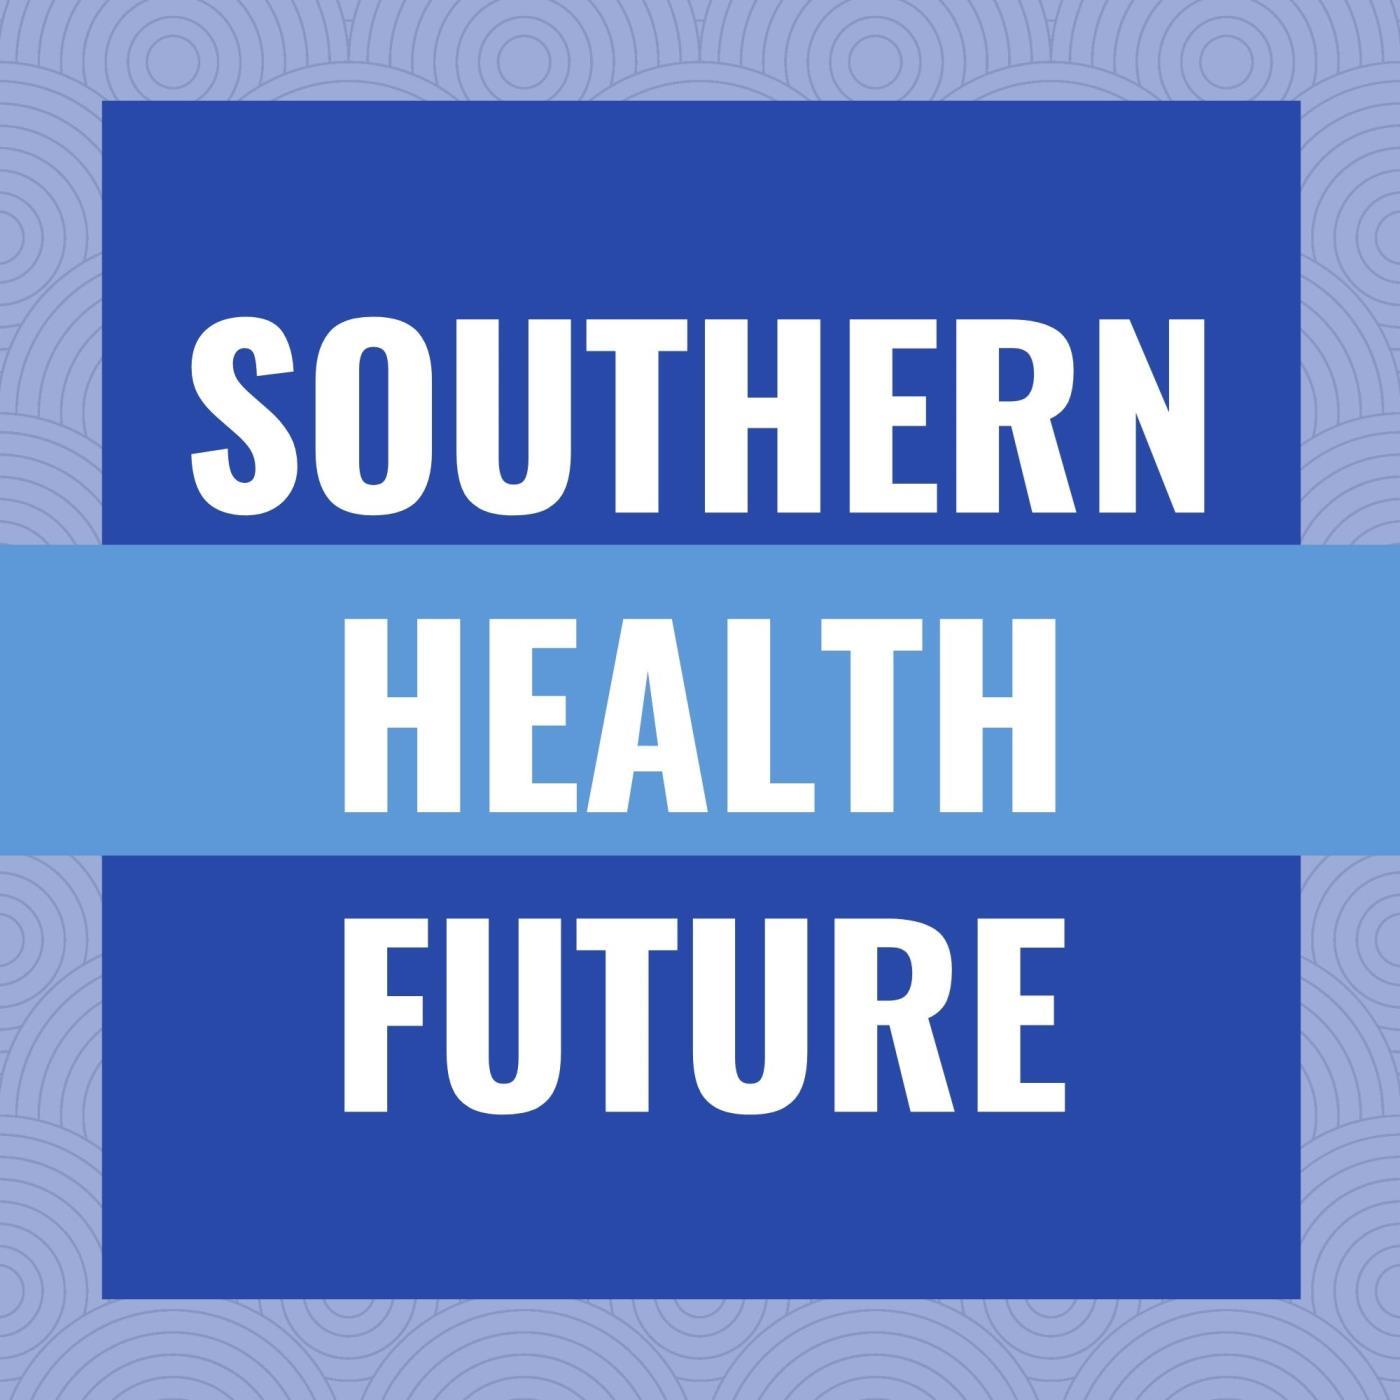 Southern Health Future - 27-10-2021 - Telehealth - Matthew Pettersson